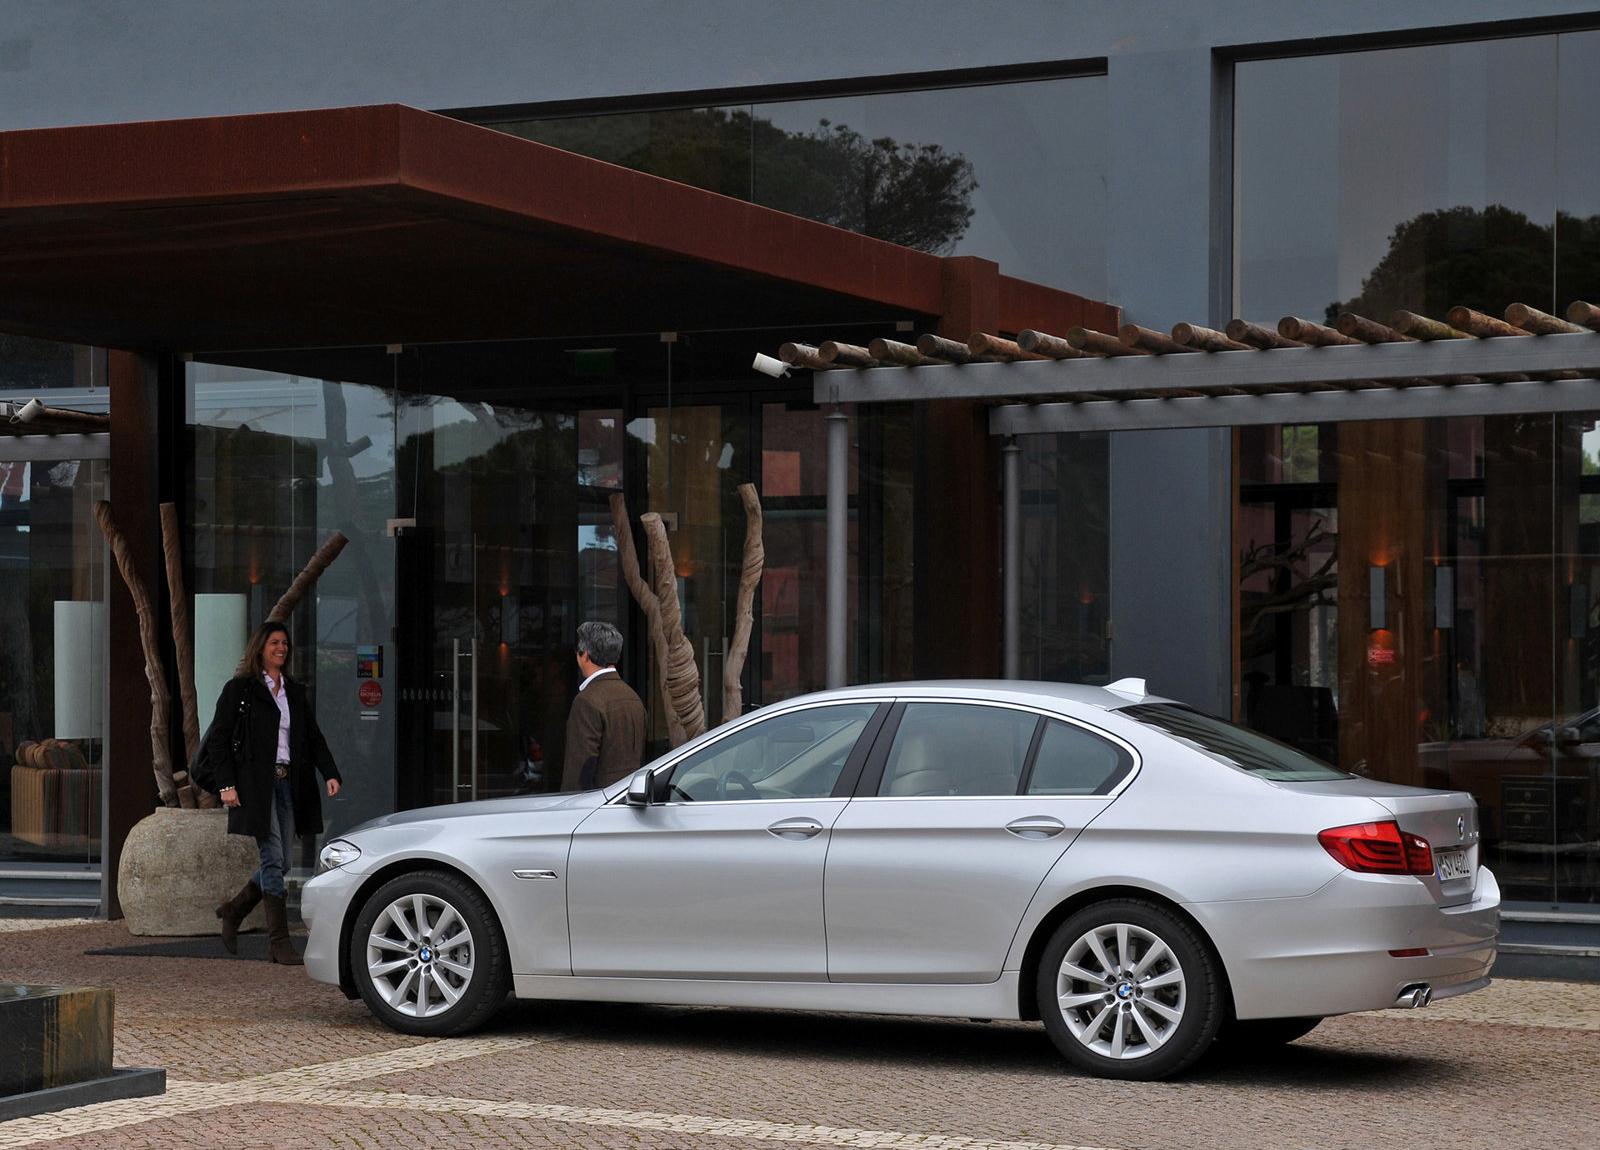 http://2.bp.blogspot.com/-zC76f38jPdw/UE376m_DNGI/AAAAAAAAHT8/xEAKuNTseY4/s1600/BMW-5-Series_2011_1600x1200_wallpaper_7e.jpg